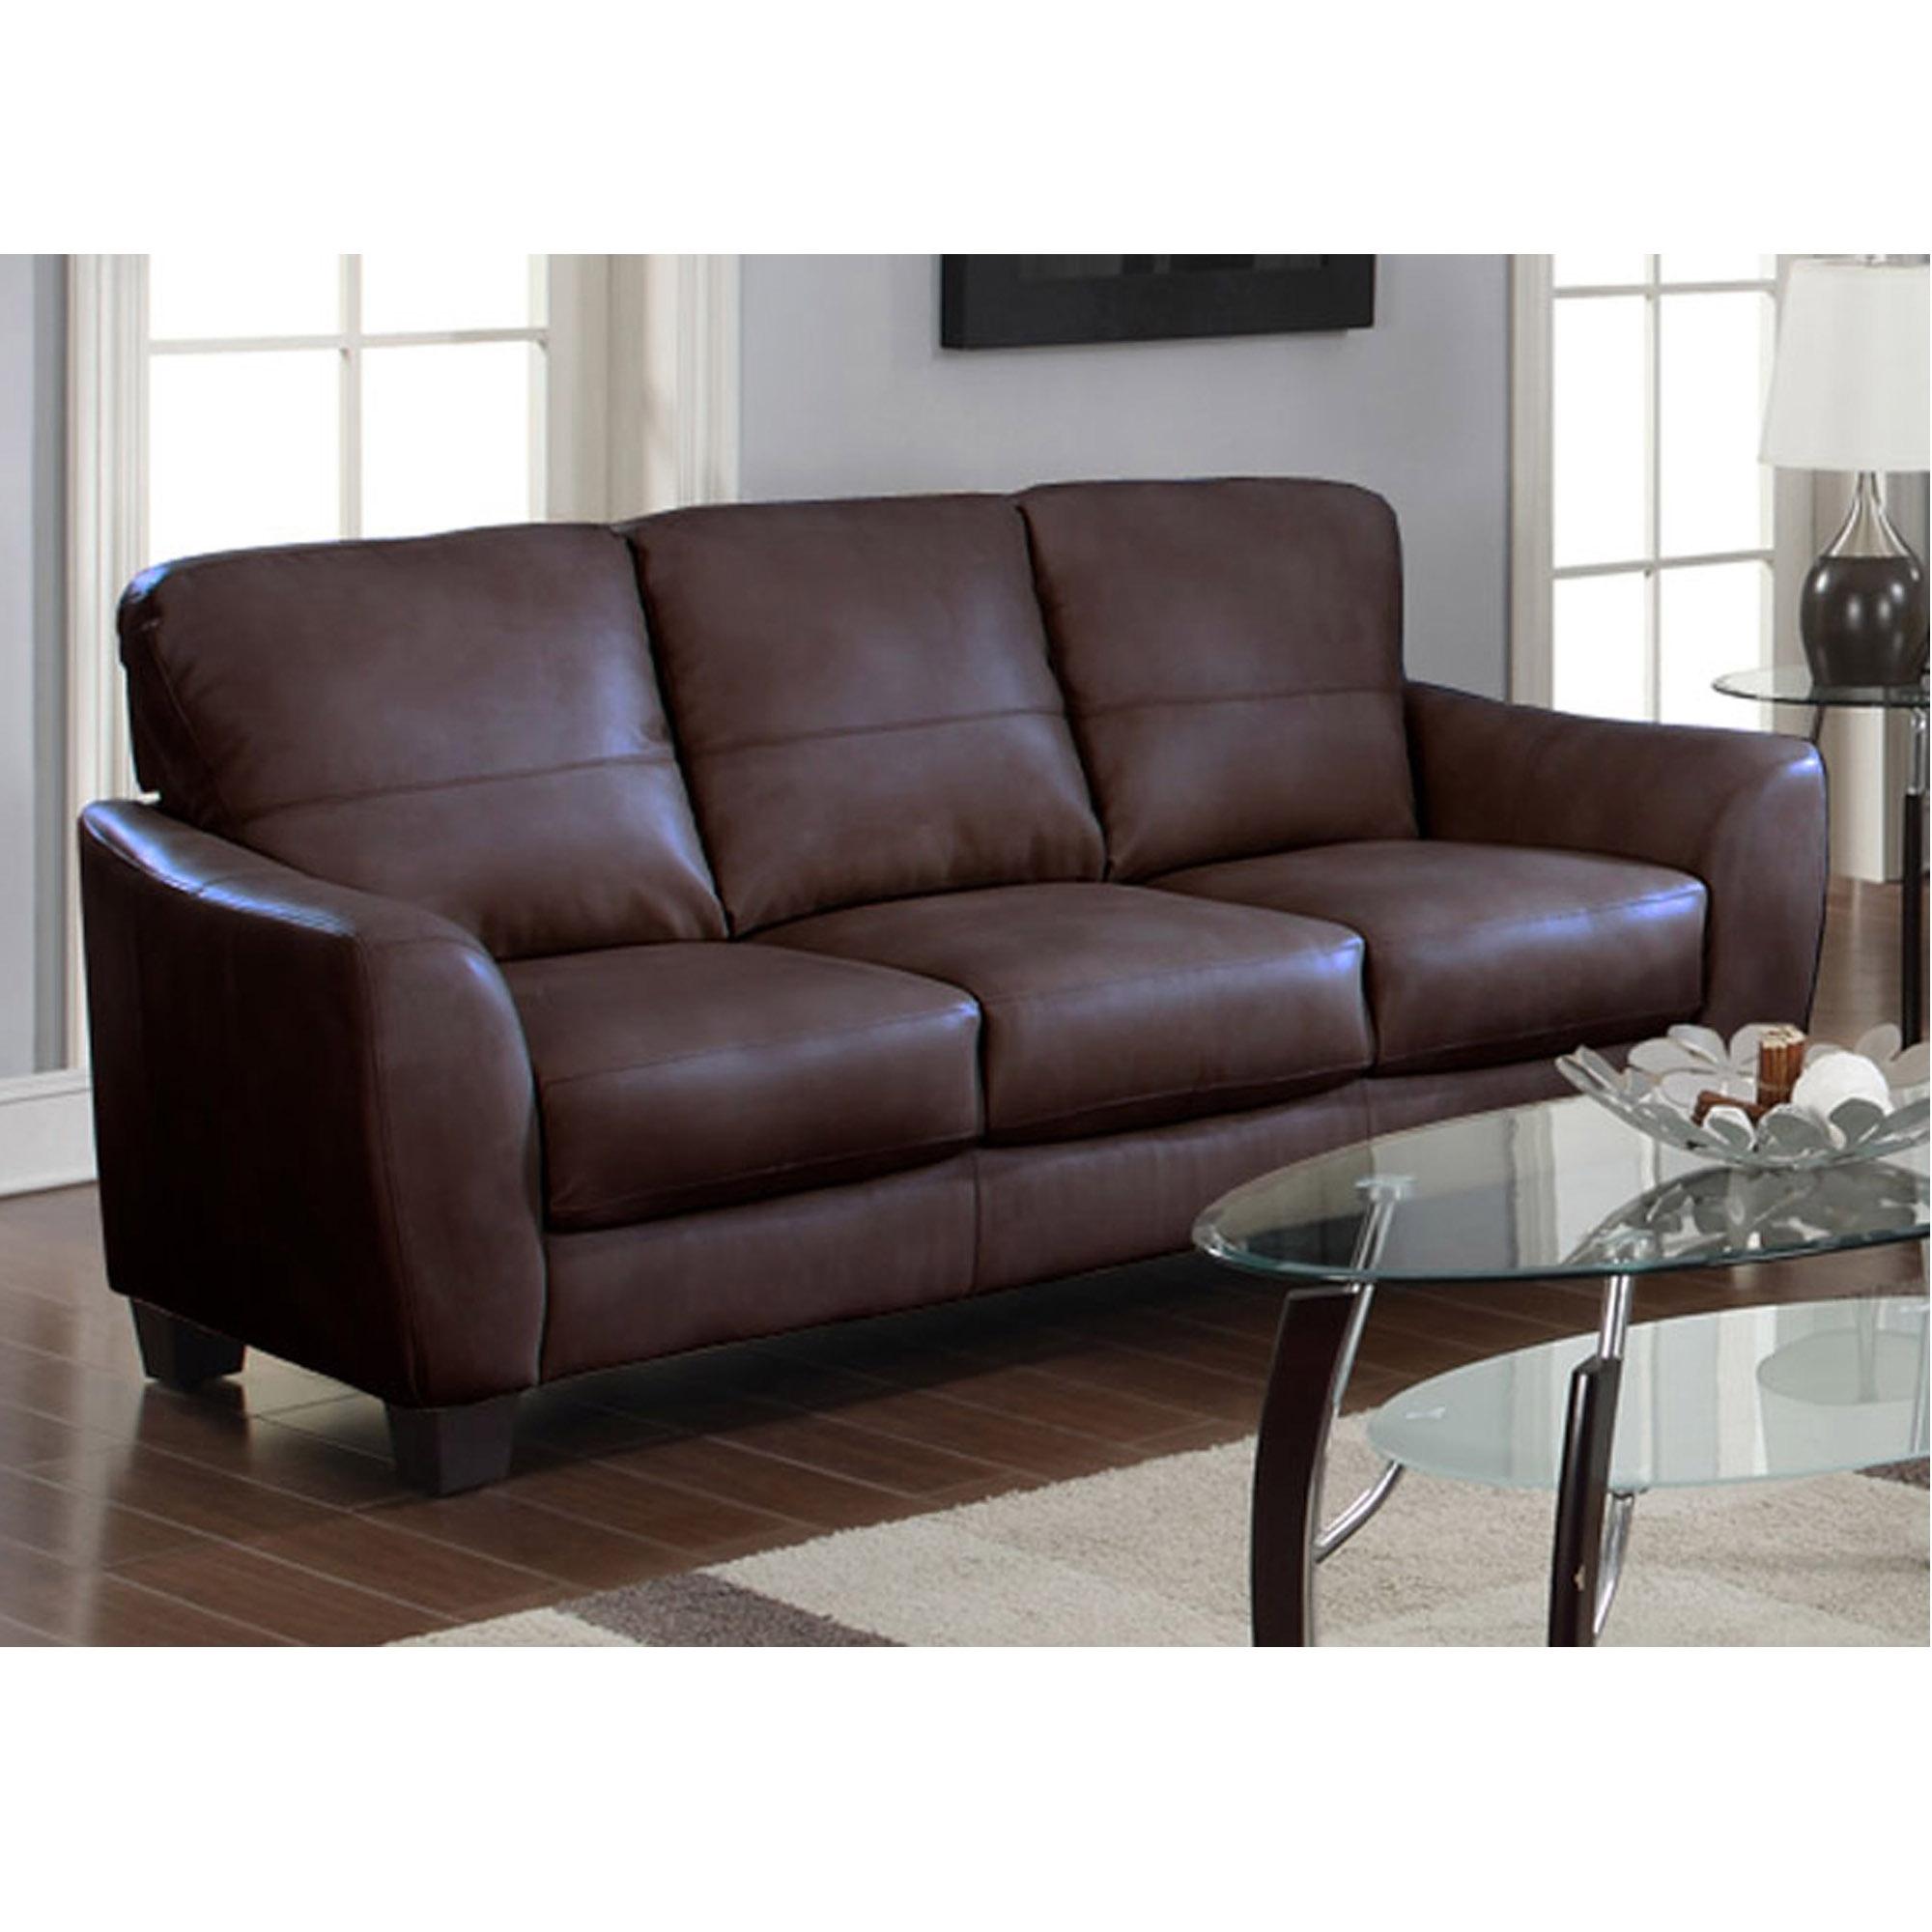 Wondrous Oregon Brown 3 Seater Sofa Ncnpc Chair Design For Home Ncnpcorg